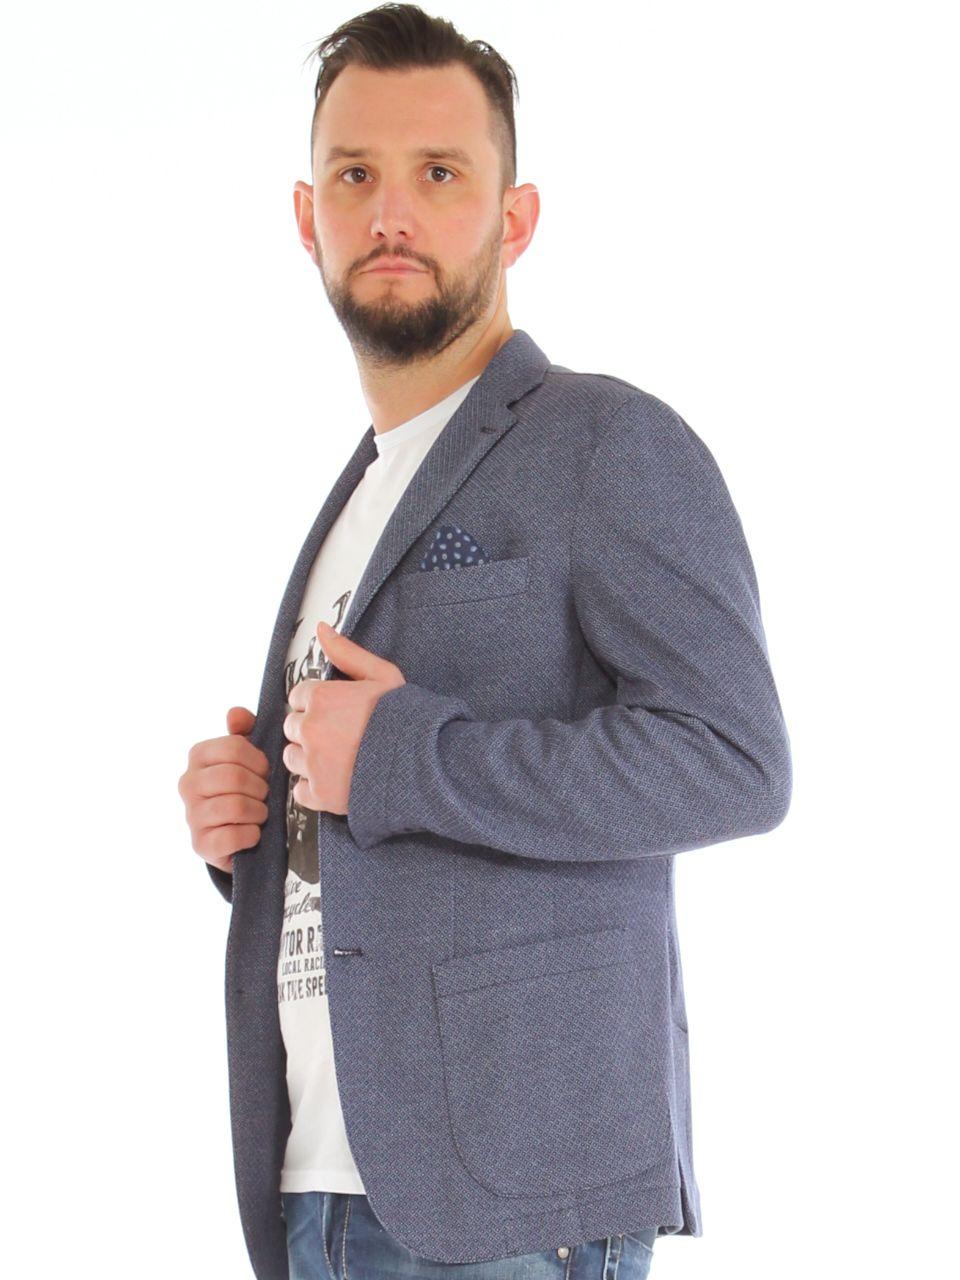 Micro patterned cotton blend slim jacket http://www.luanaromizi.com/en/jackets-blazers-man/micro-patterned-cotton-blend-slim-jacket.html #Micropatterned #cotton #blend #slimjacket #fashion #style #moda #abbigliamento #clothing #madeinitaly #shopping